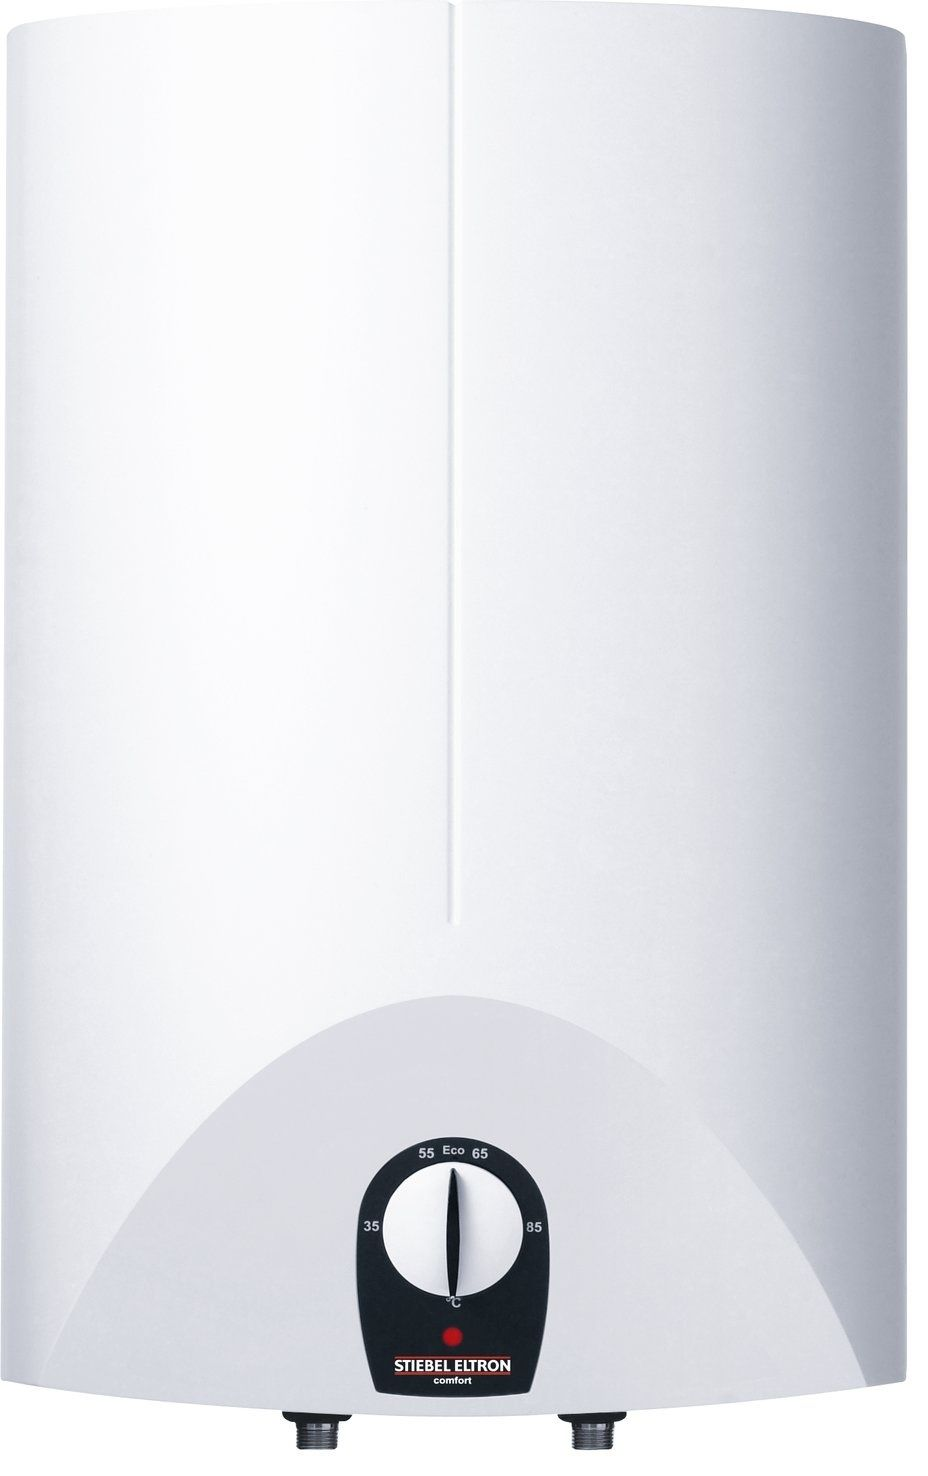 Warmwasserboiler Stiebel Eltron de stiebel eltron sh close-up 15 liter keukenboiler is een boiler